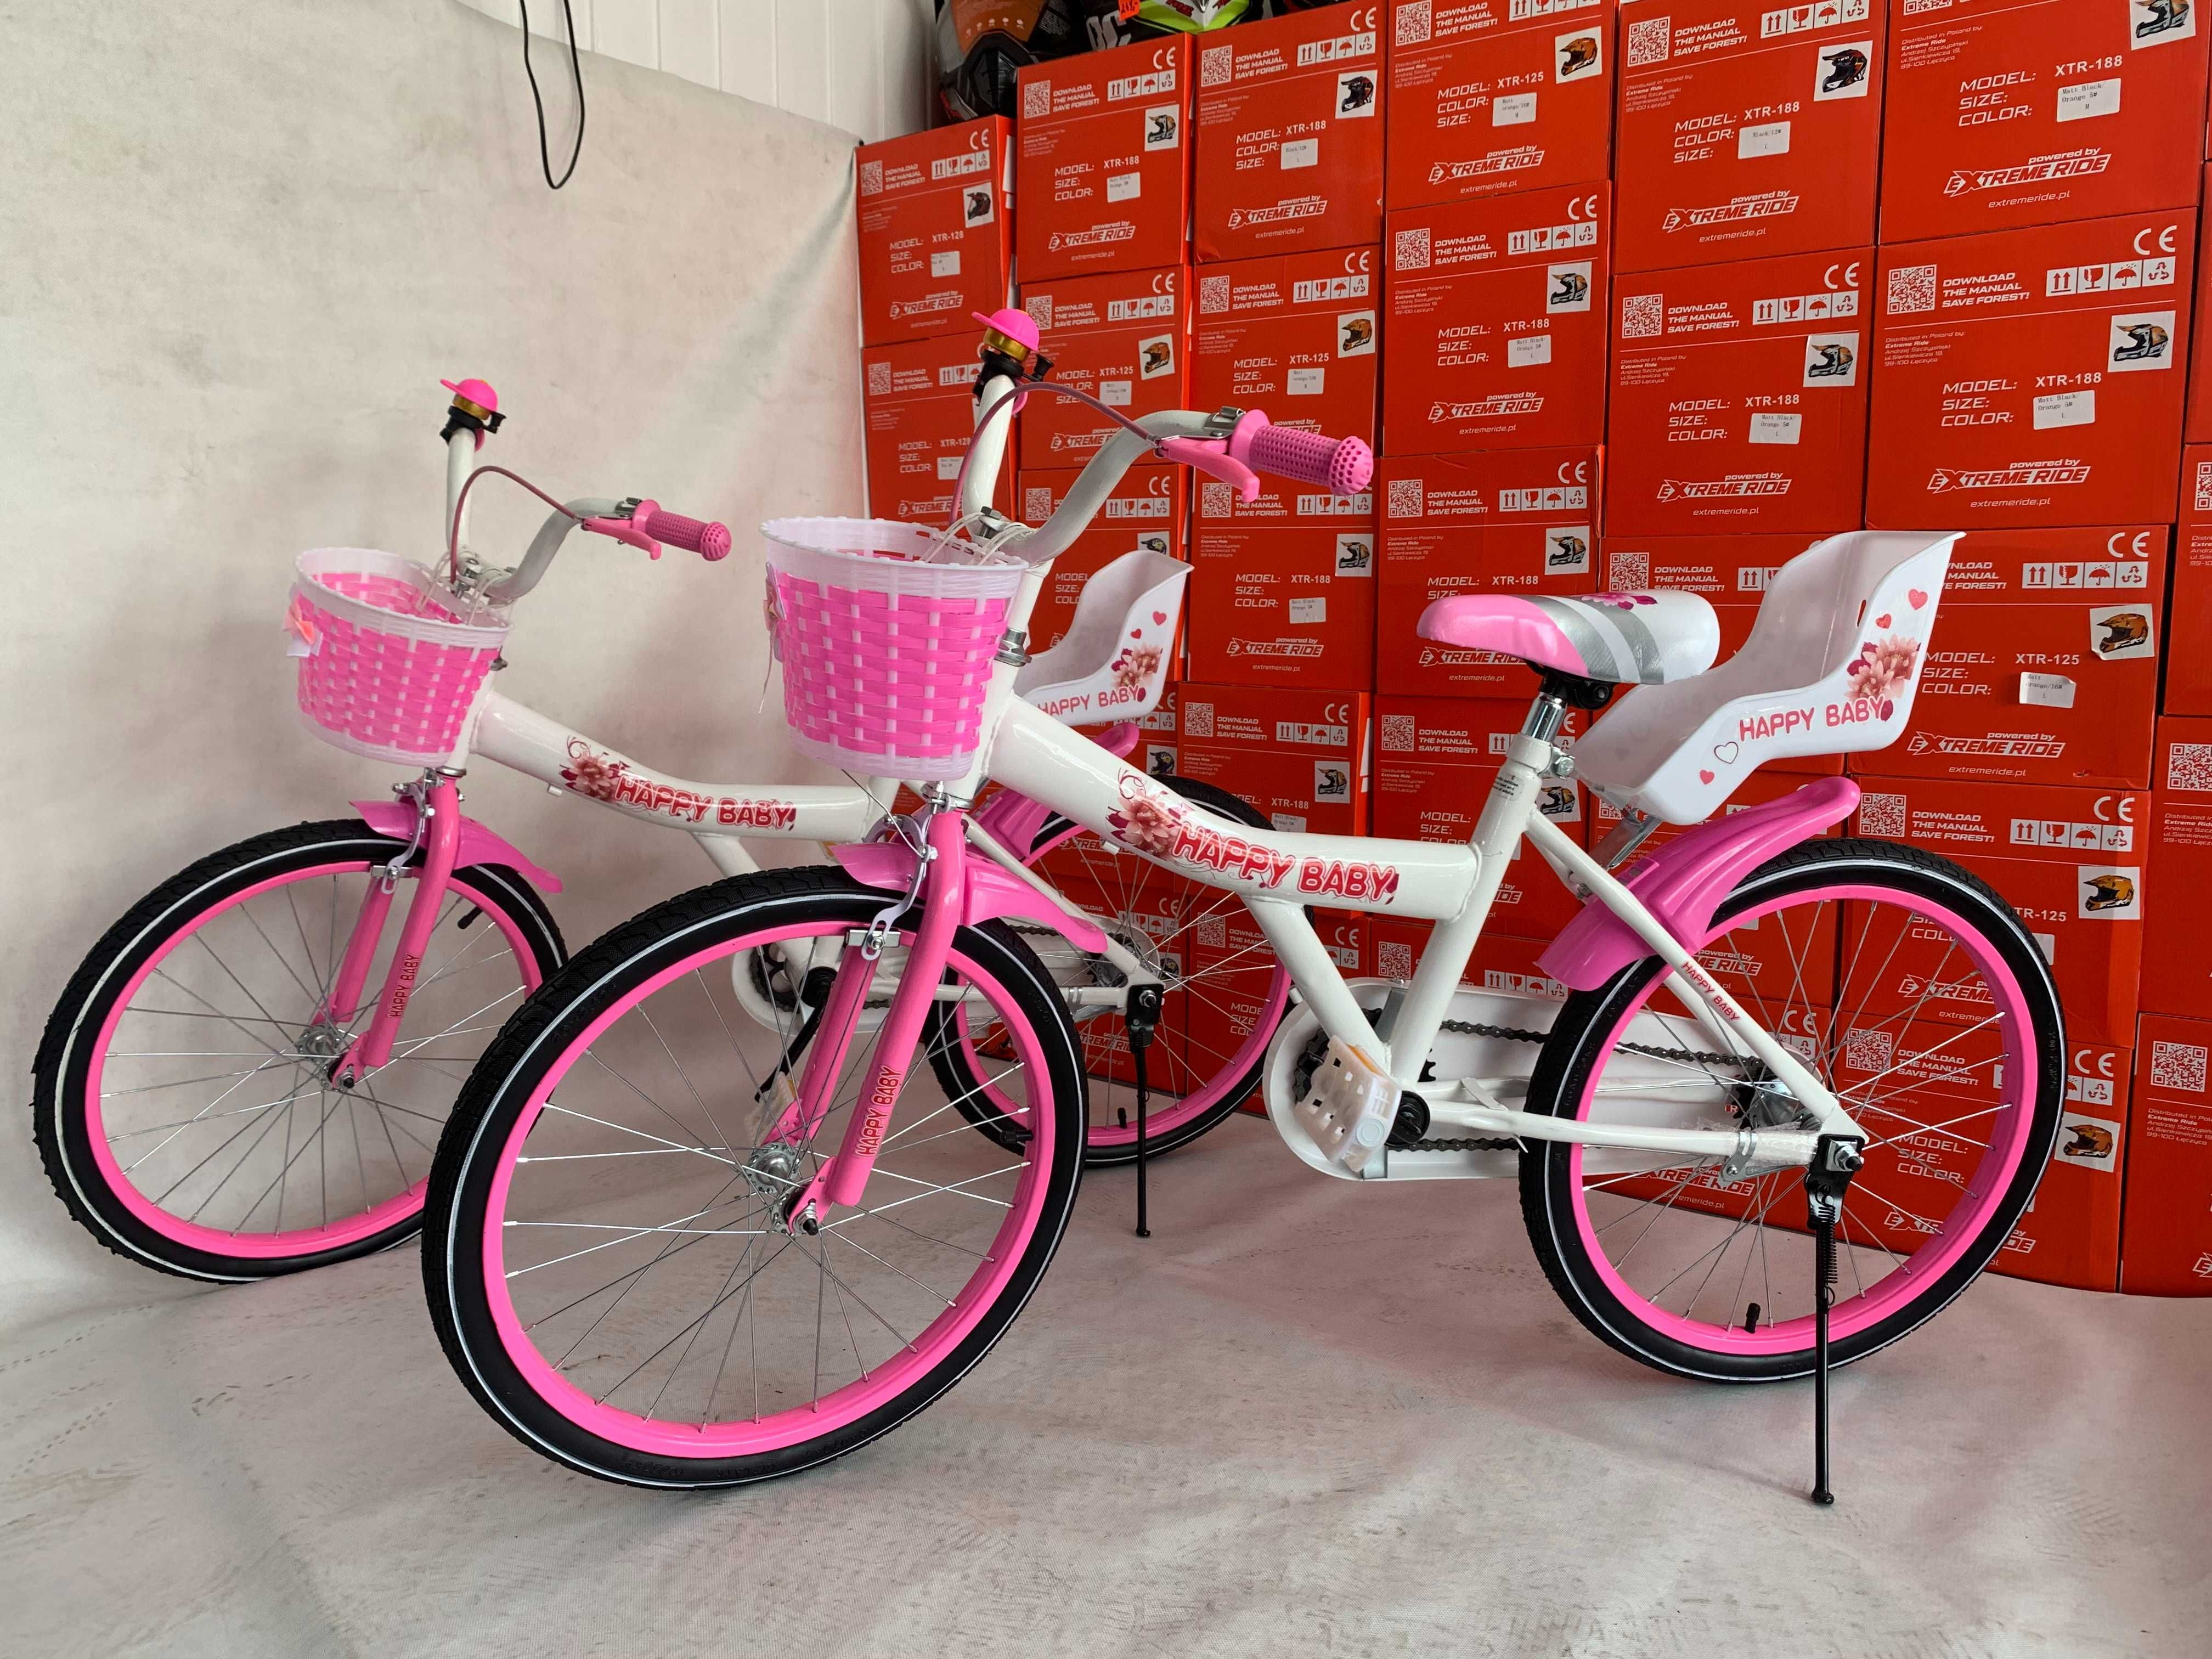 Rowerek, rower 20 cali Happy Baby, koszyk, fotelik dla lalek